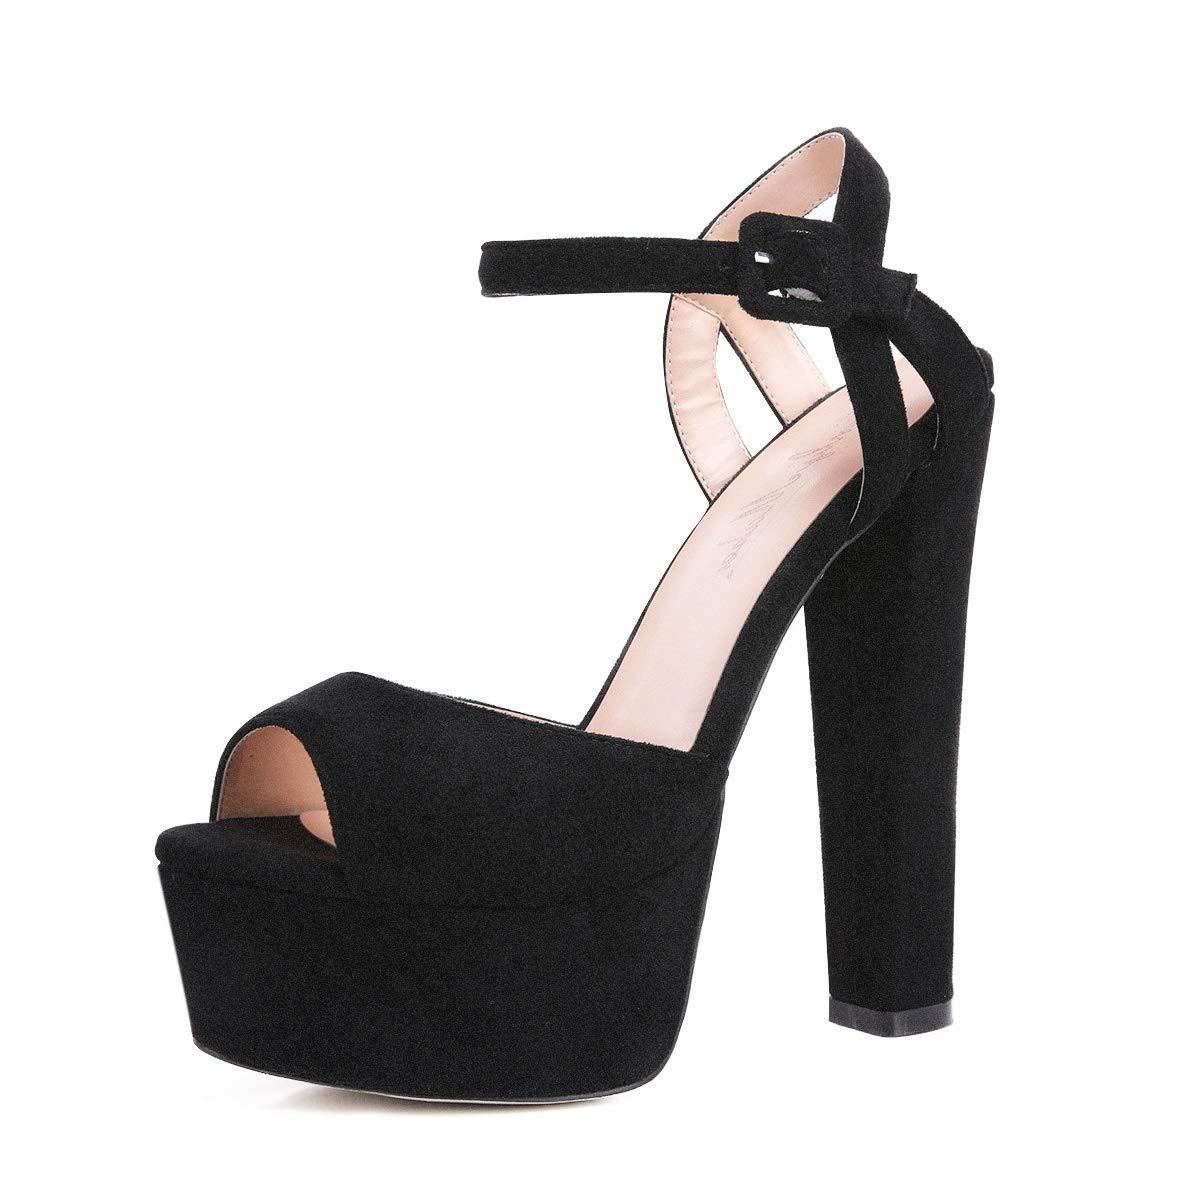 7bc30d5e3cf38 Onlymaker Women's Platform Chunky High Heels Faux Suede Ankle Strap Peep  Toe Sandal Pumps Dress Party Shoes